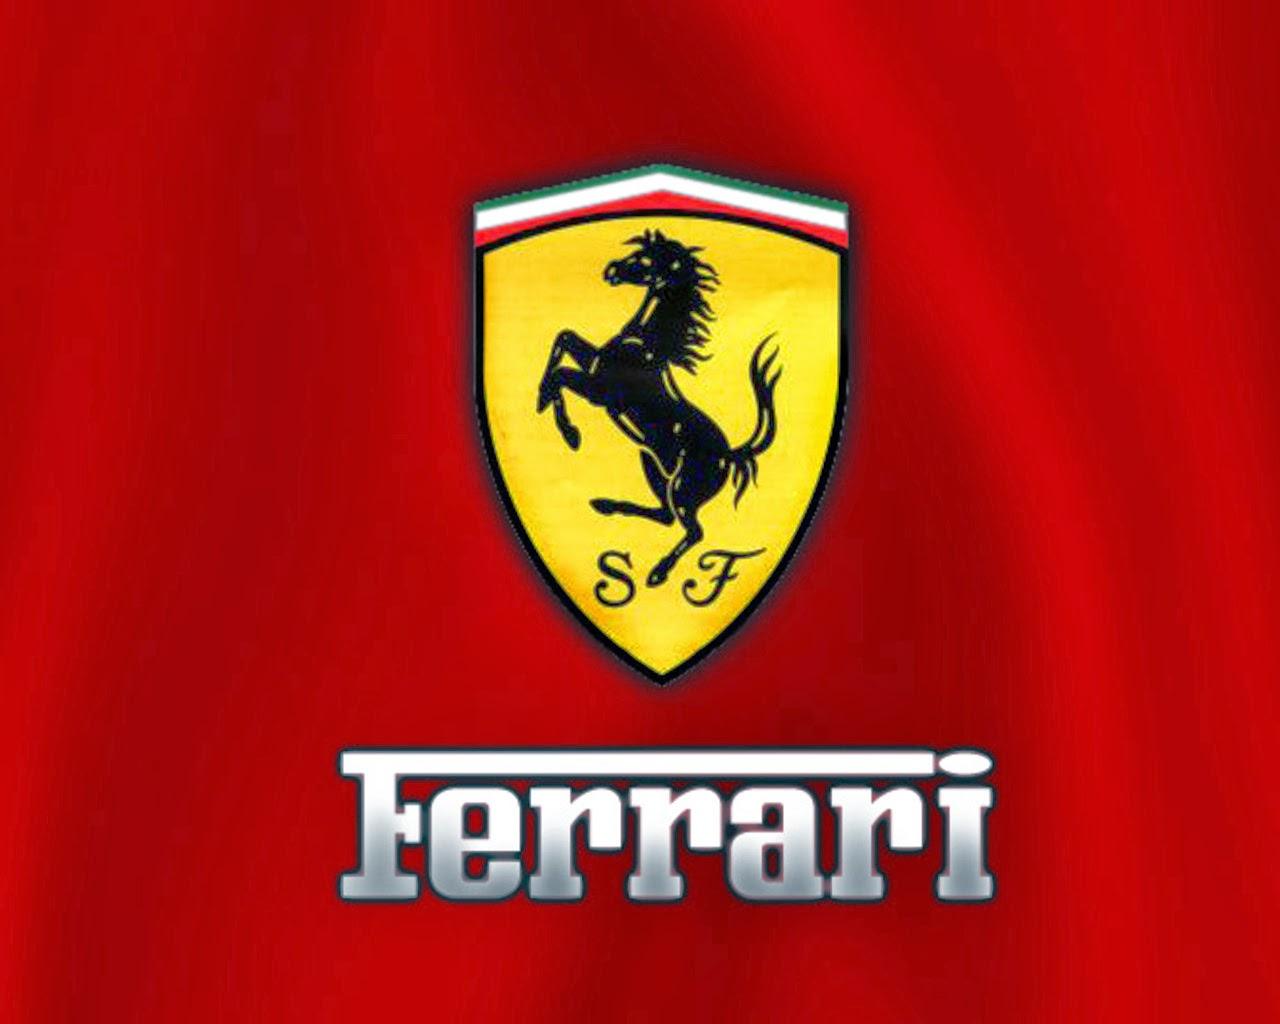 Ferrari Car Images Free Download Free Download,ferrari Logo